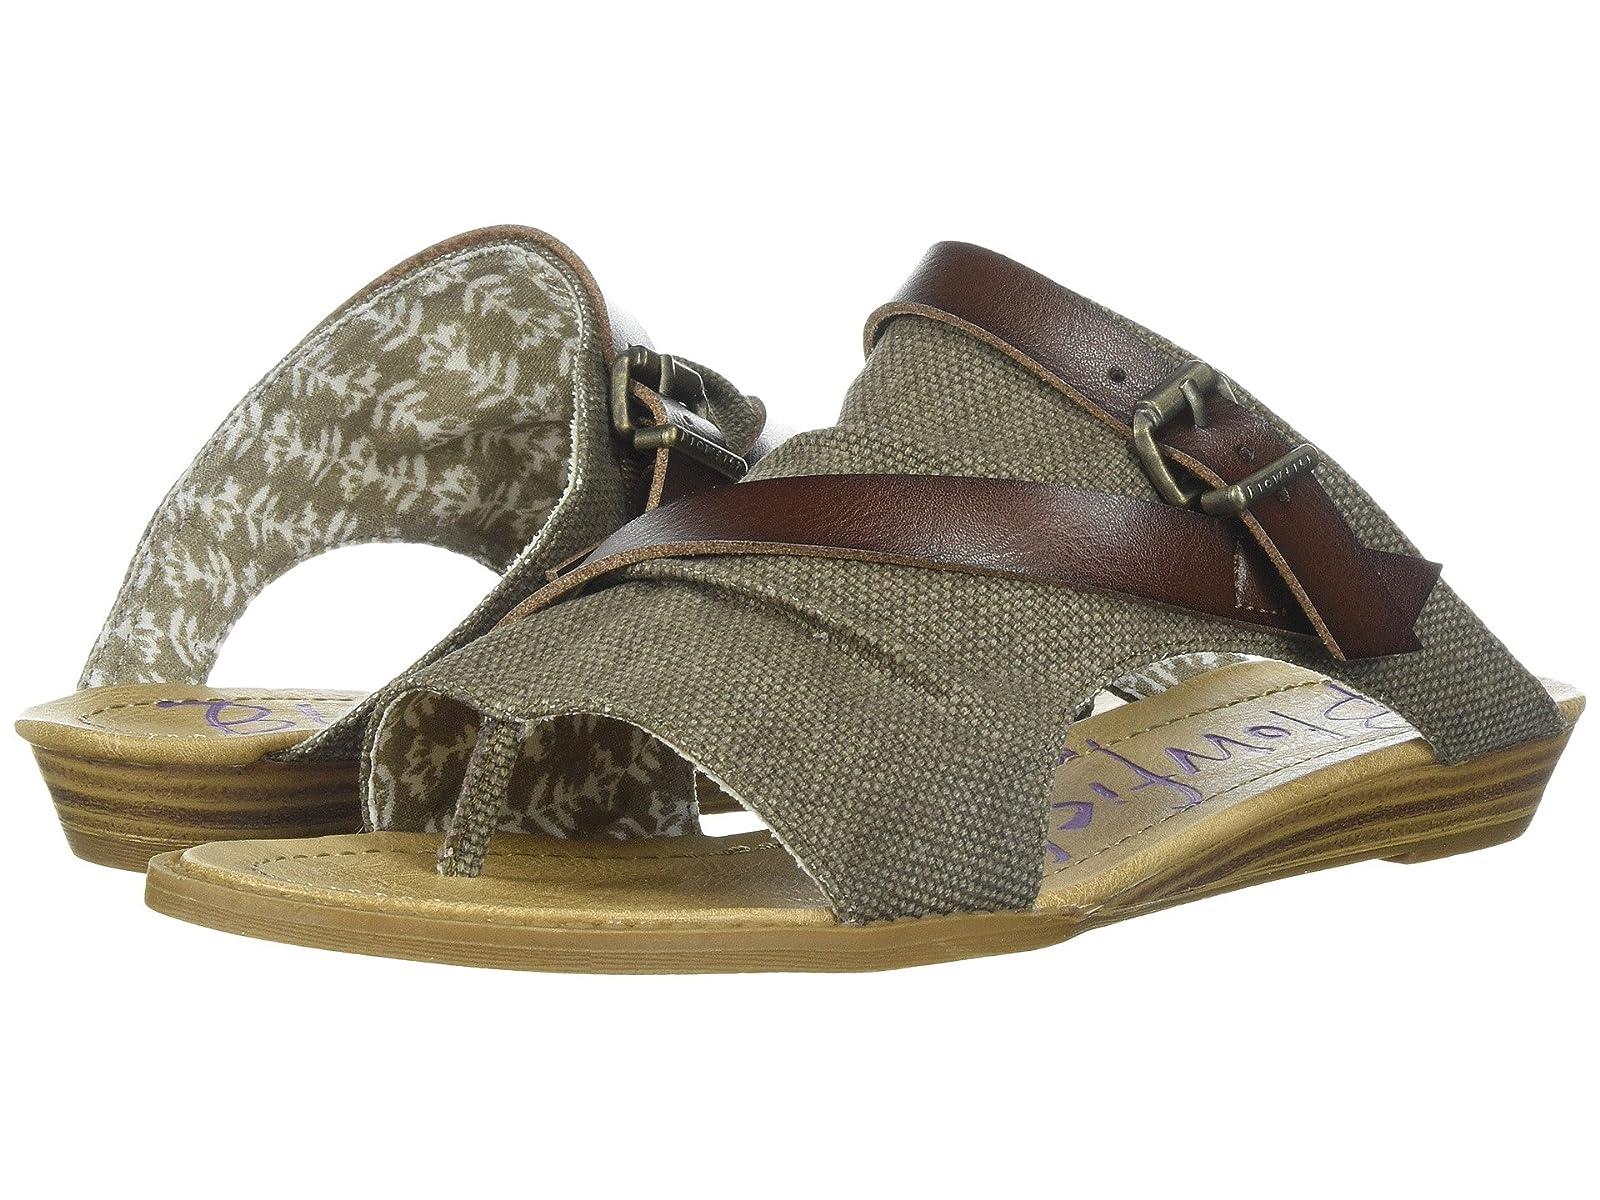 Blowfish BarriaComfortable and distinctive shoes